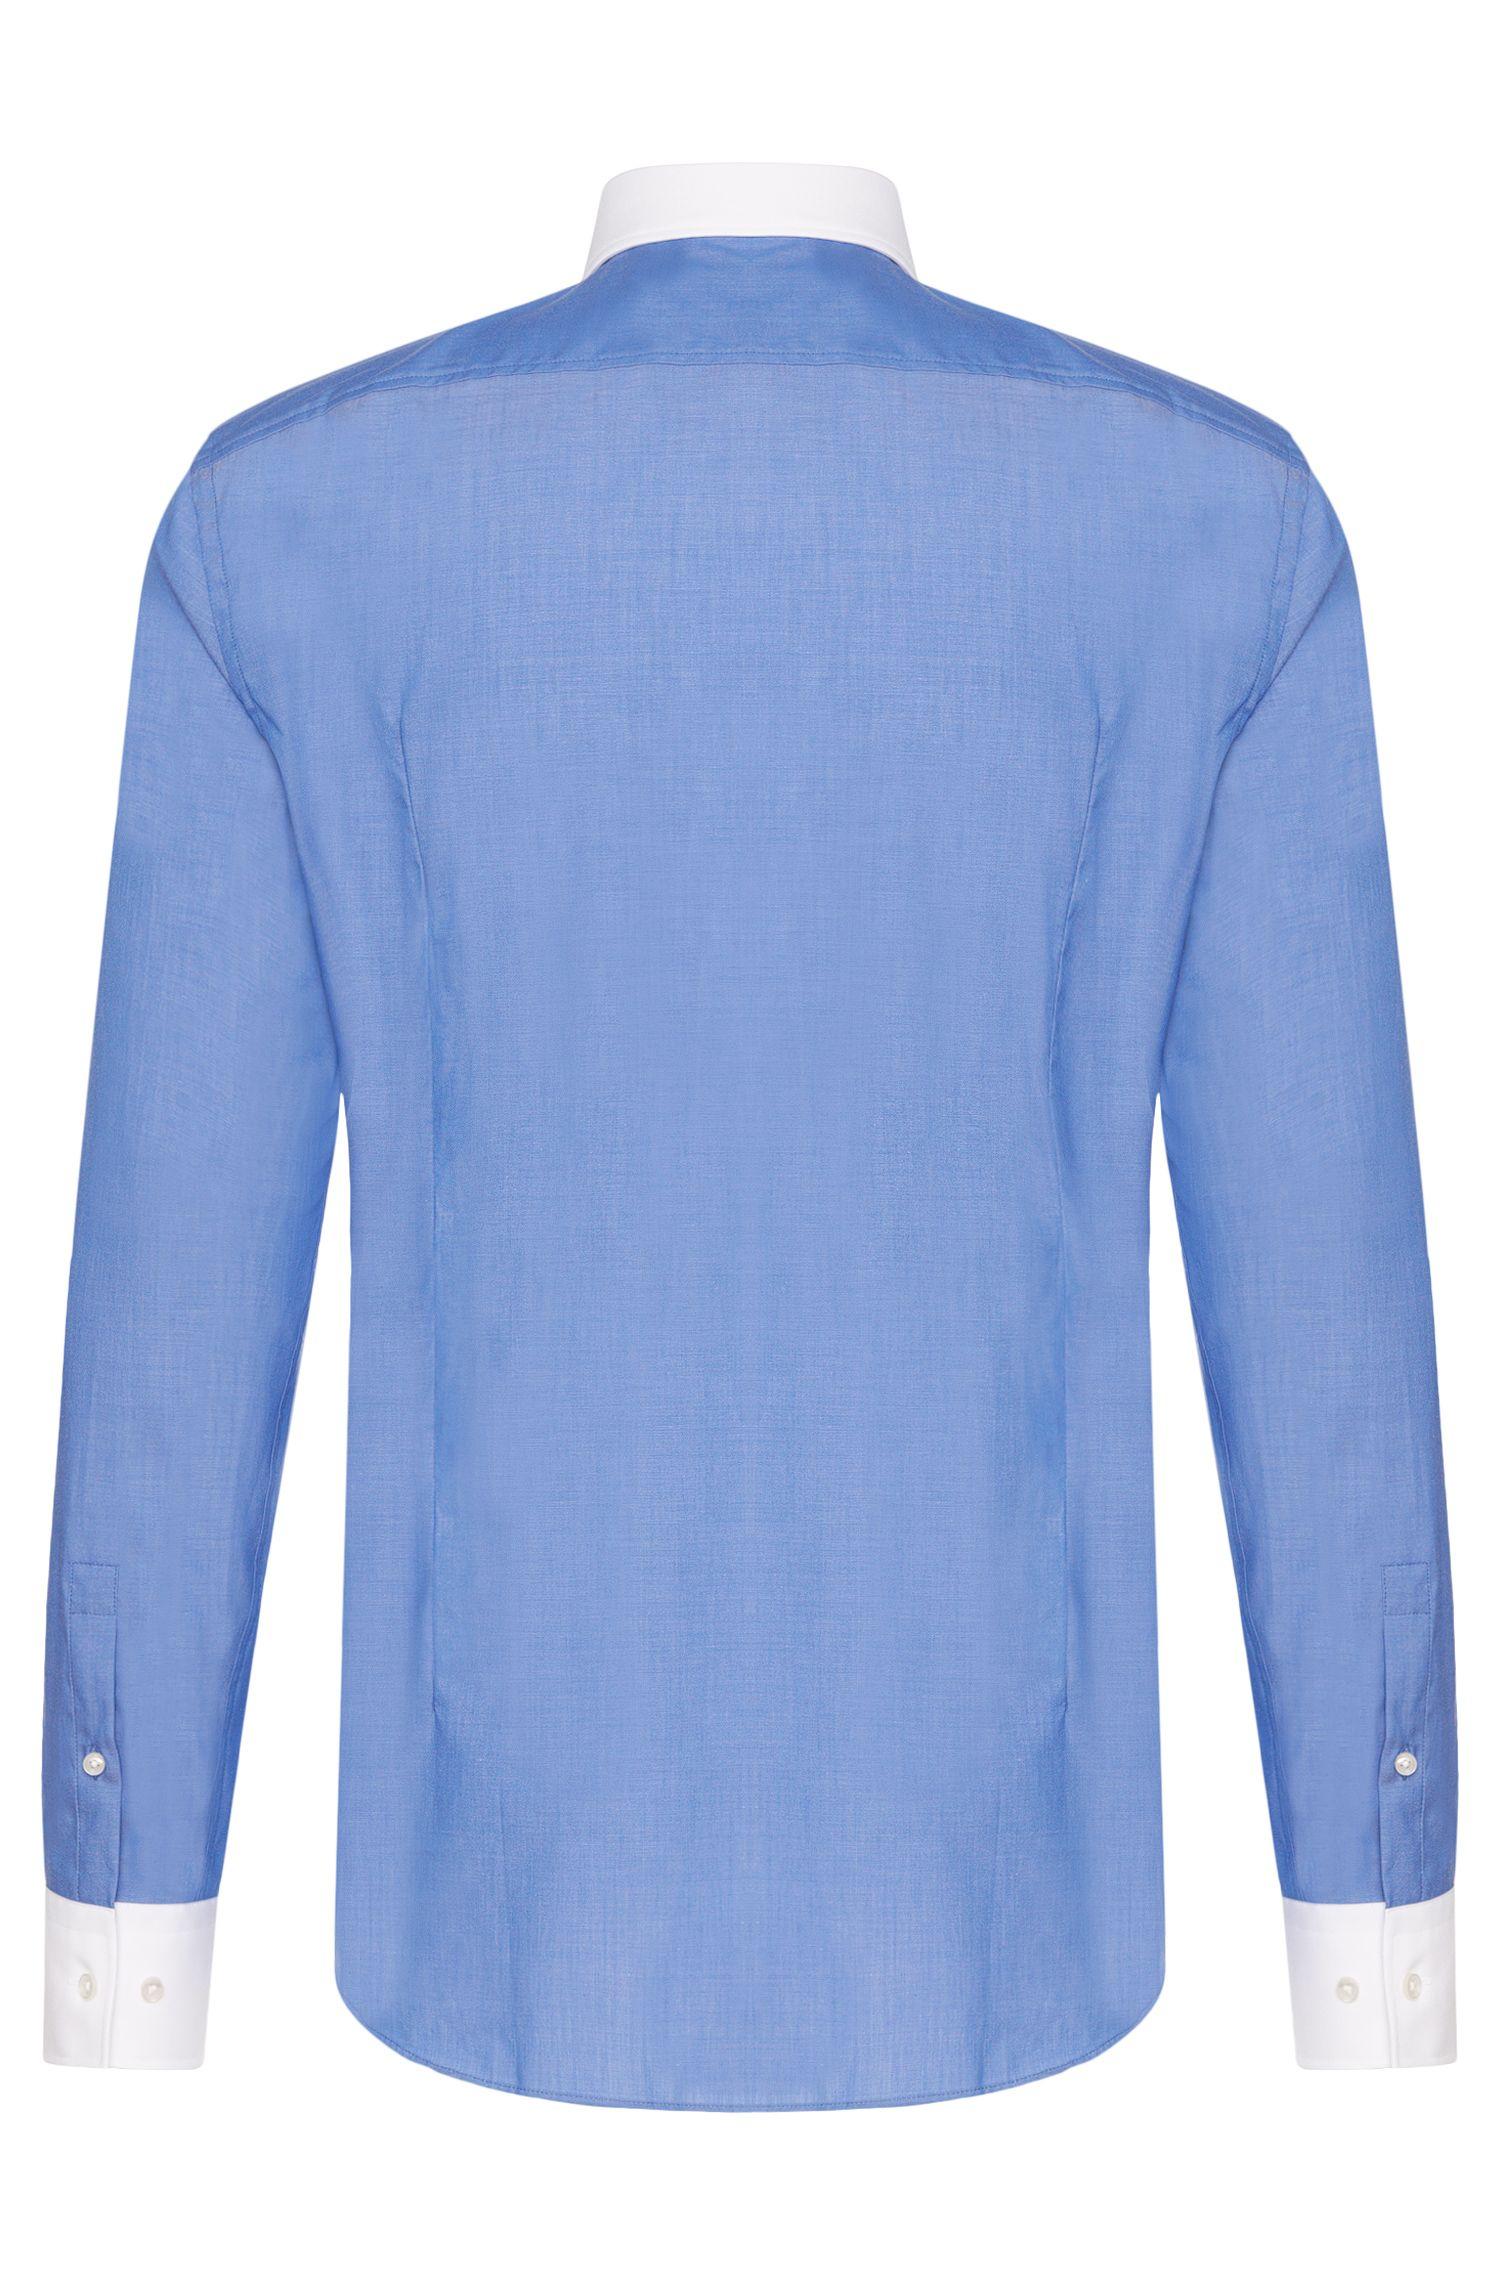 Slim-Fit Hemd aus Baumwolle mit Kontrast-Details: 'Jonnes'